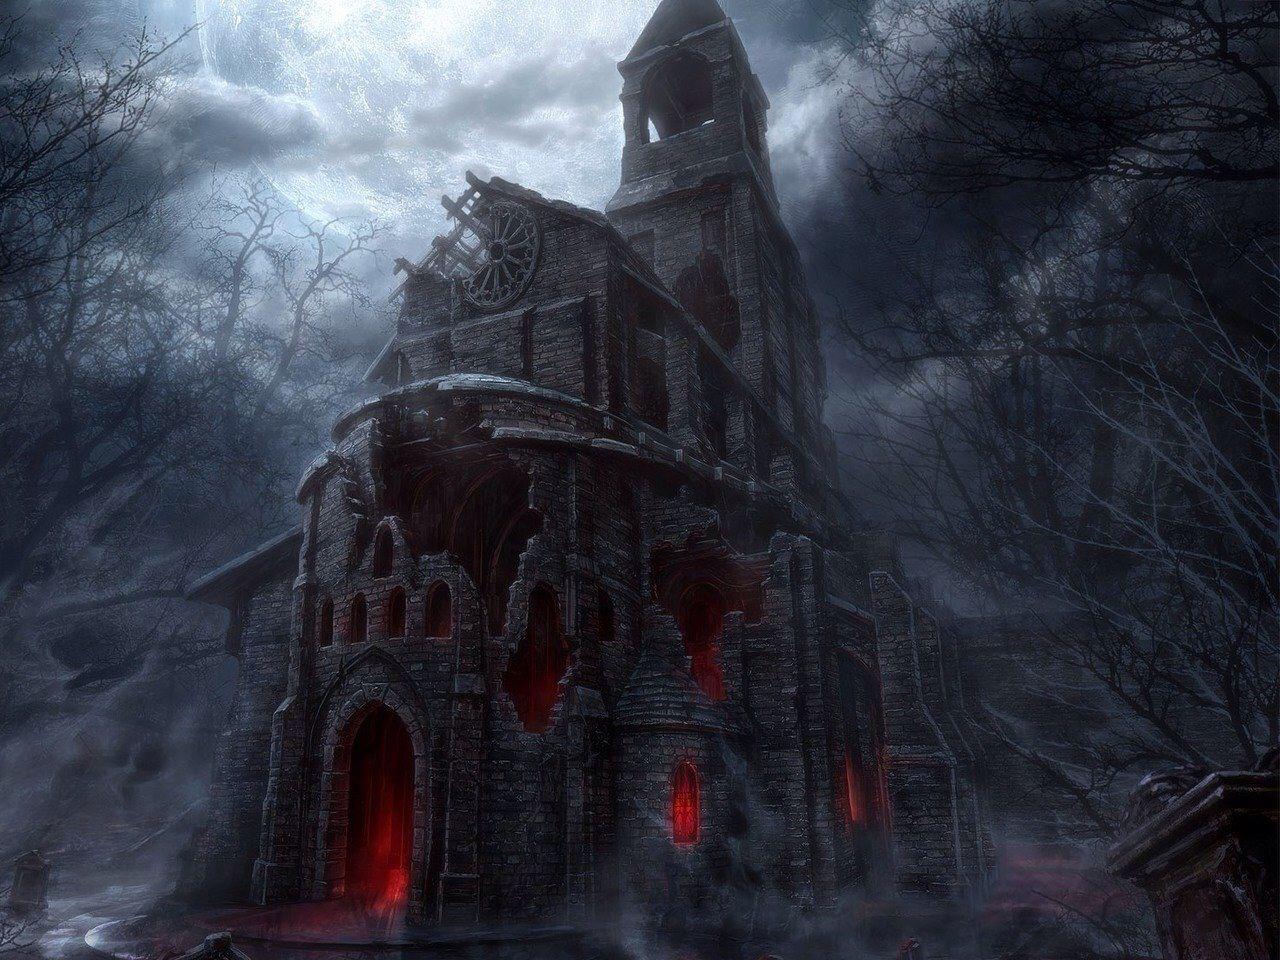 Terror Fondo De Pantalla Gótico Castillos Encantados Castillo Oscuro